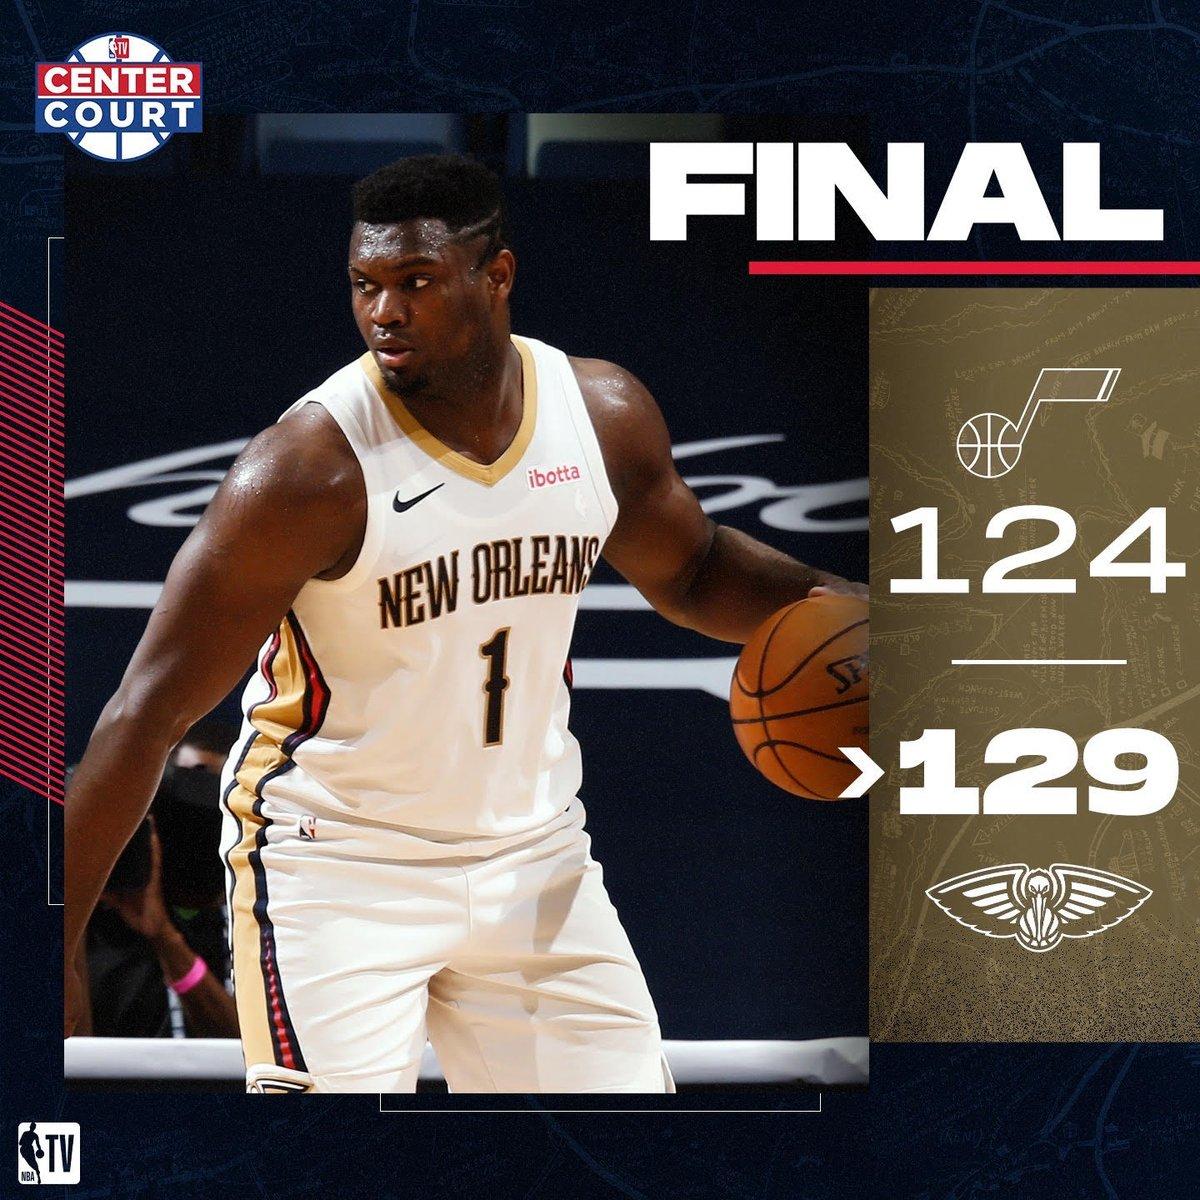 @NBATV's photo on Pelicans